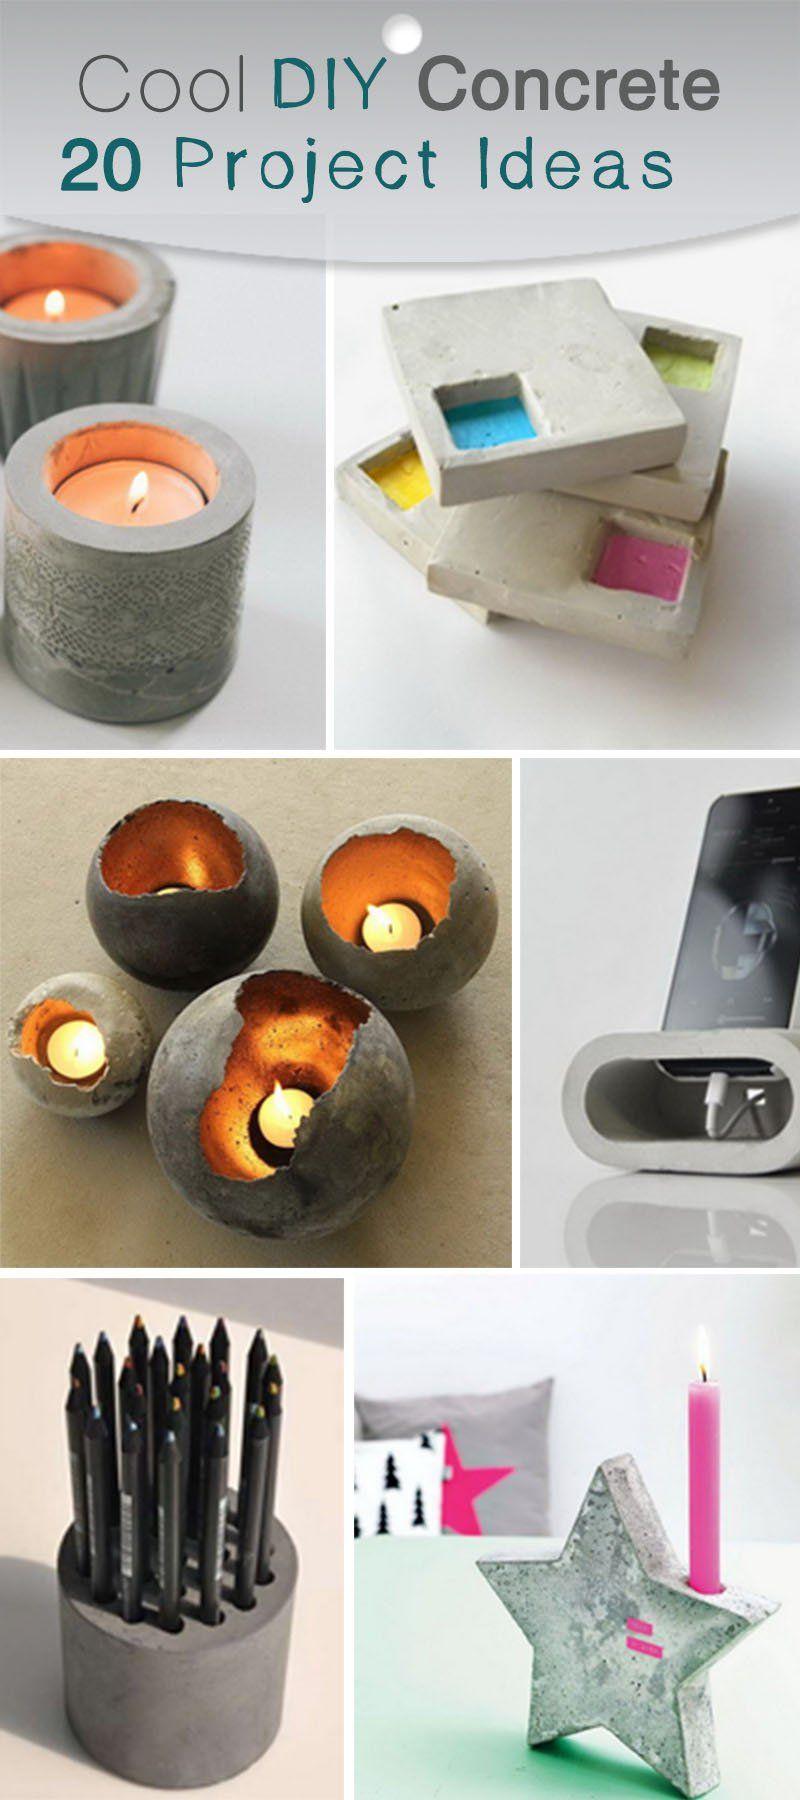 Diy Beton Schön Cool Diy Concrete Project Ideas гРина Репка